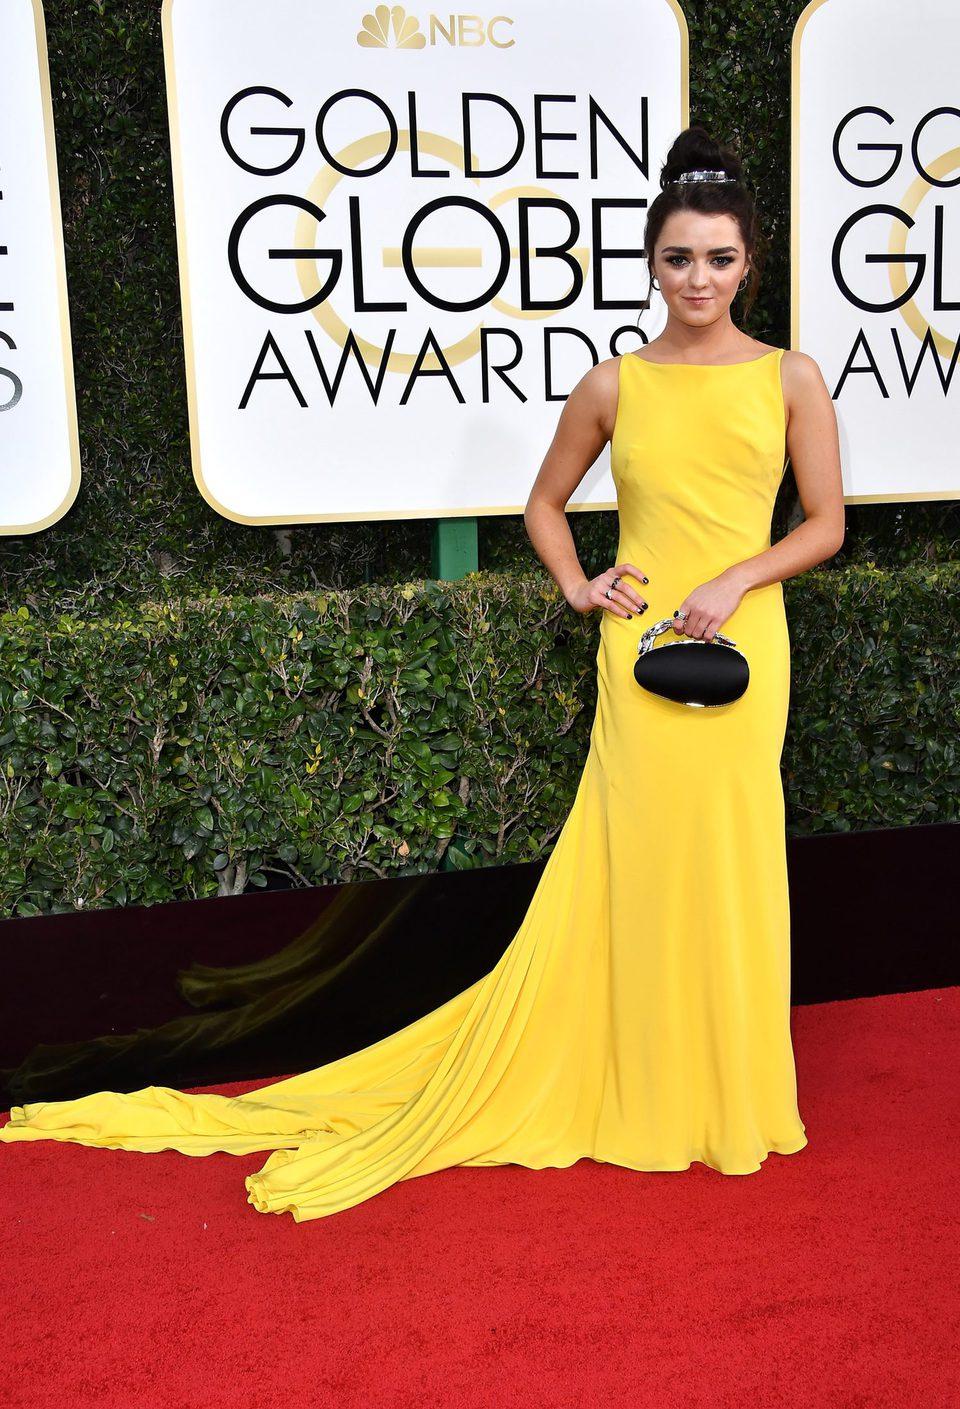 Maisie Williams at Golden Globes 2017 red carpet